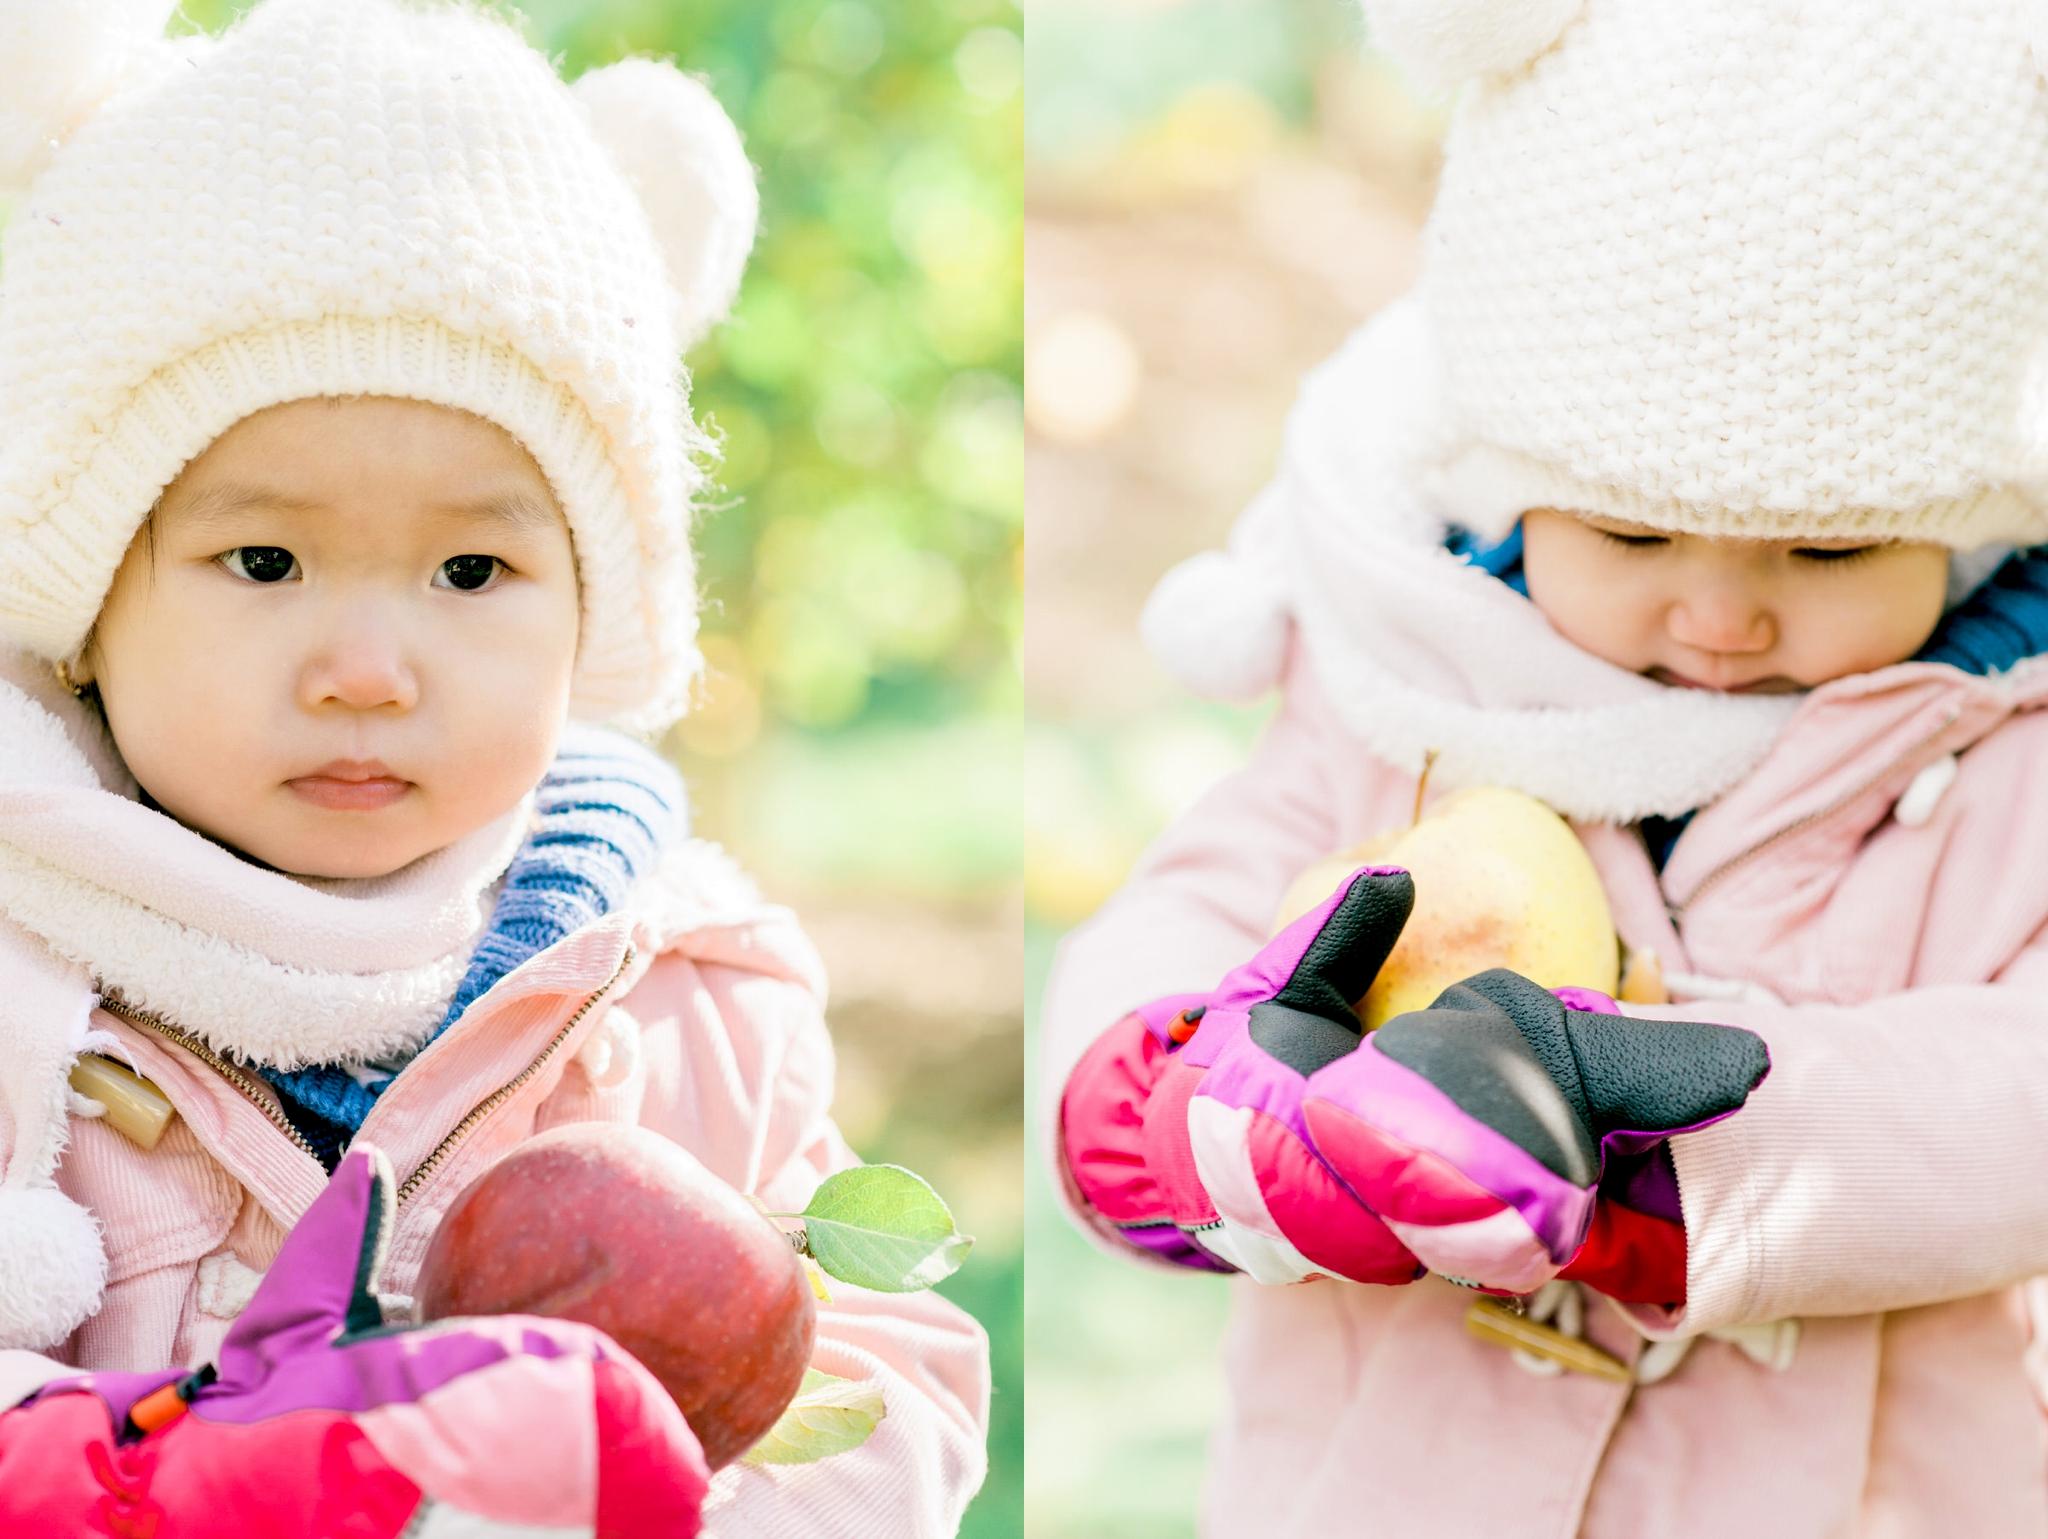 Child holding her apple